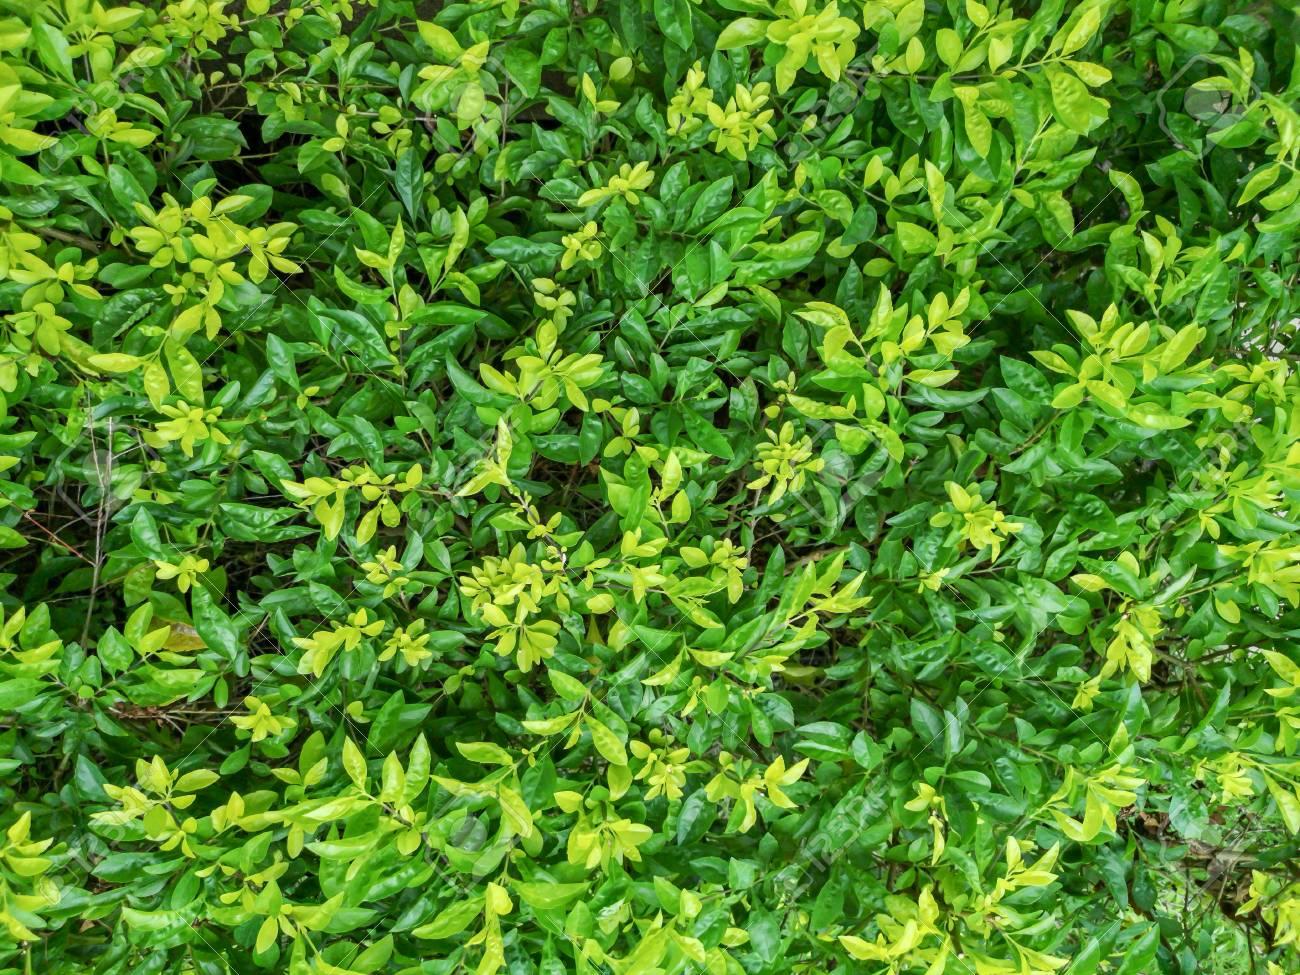 Green fresh natural leaves background in garden - 106141228